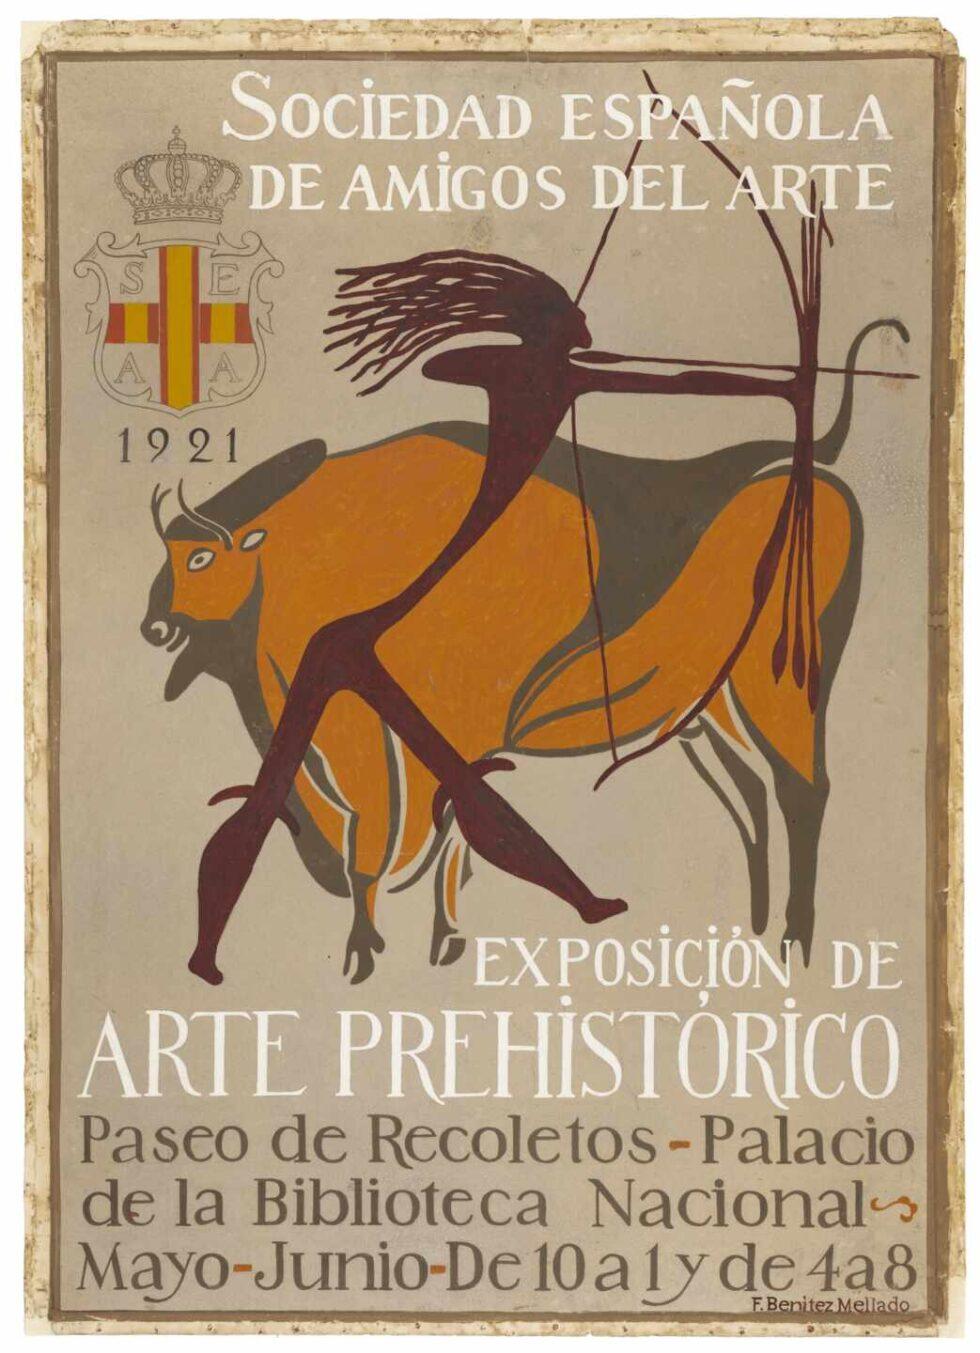 Dibujo original para cartel de Exposición de Arte Prehistórico